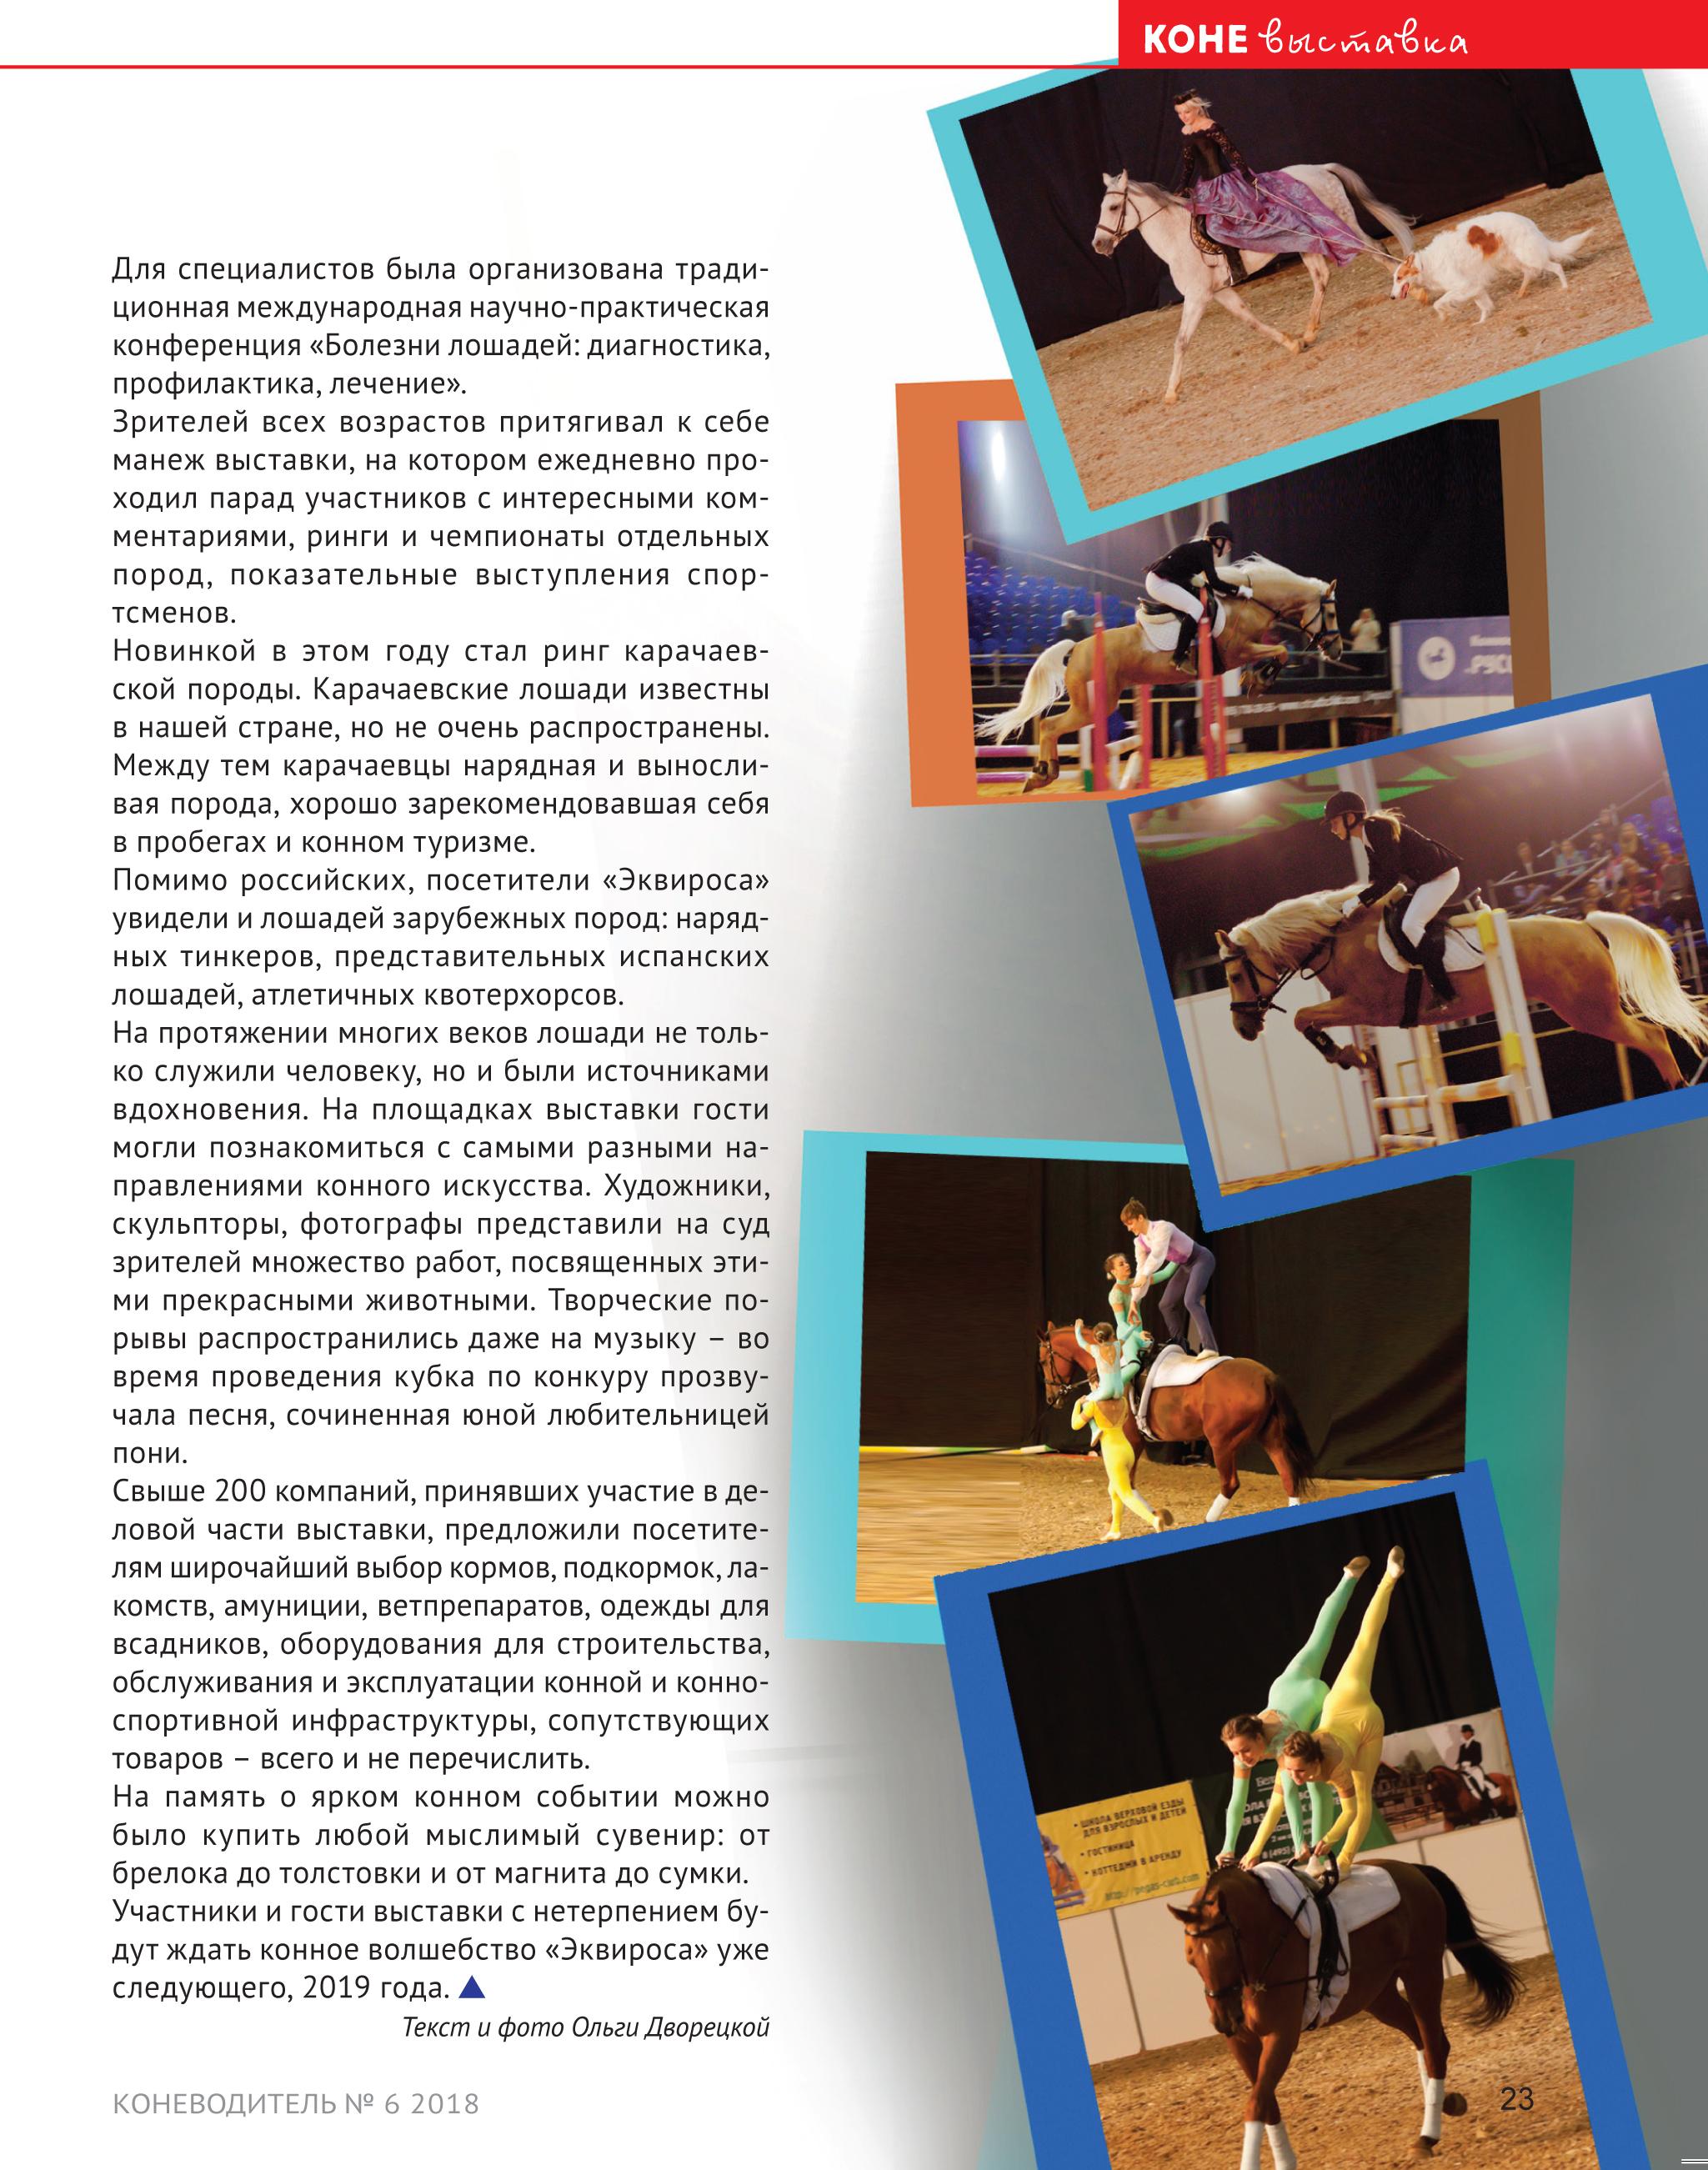 Book KONEVODITEL 62018 print-23